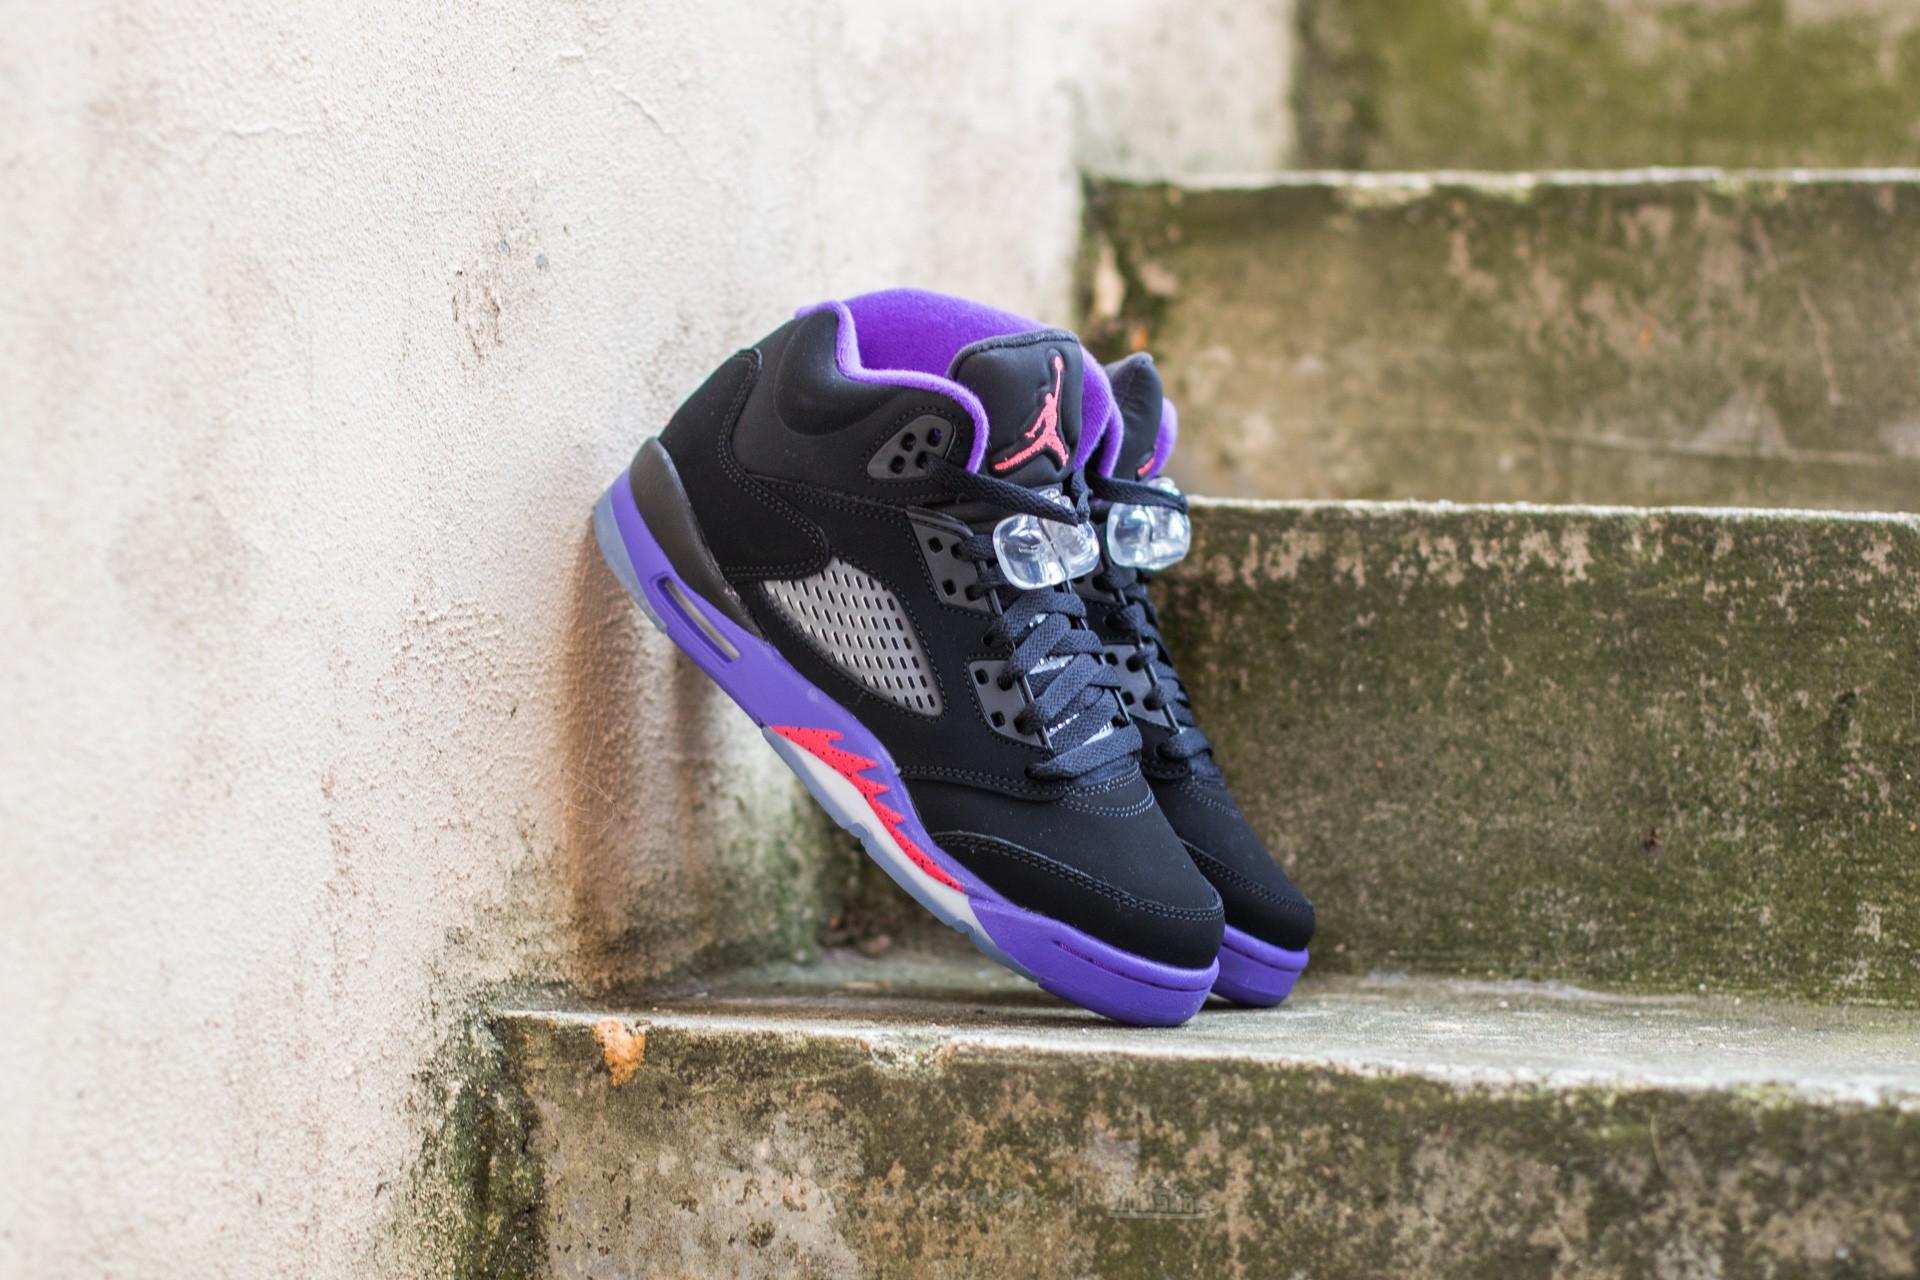 separation shoes 65473 52cc1 Air Jordan 5 Retro (GG)